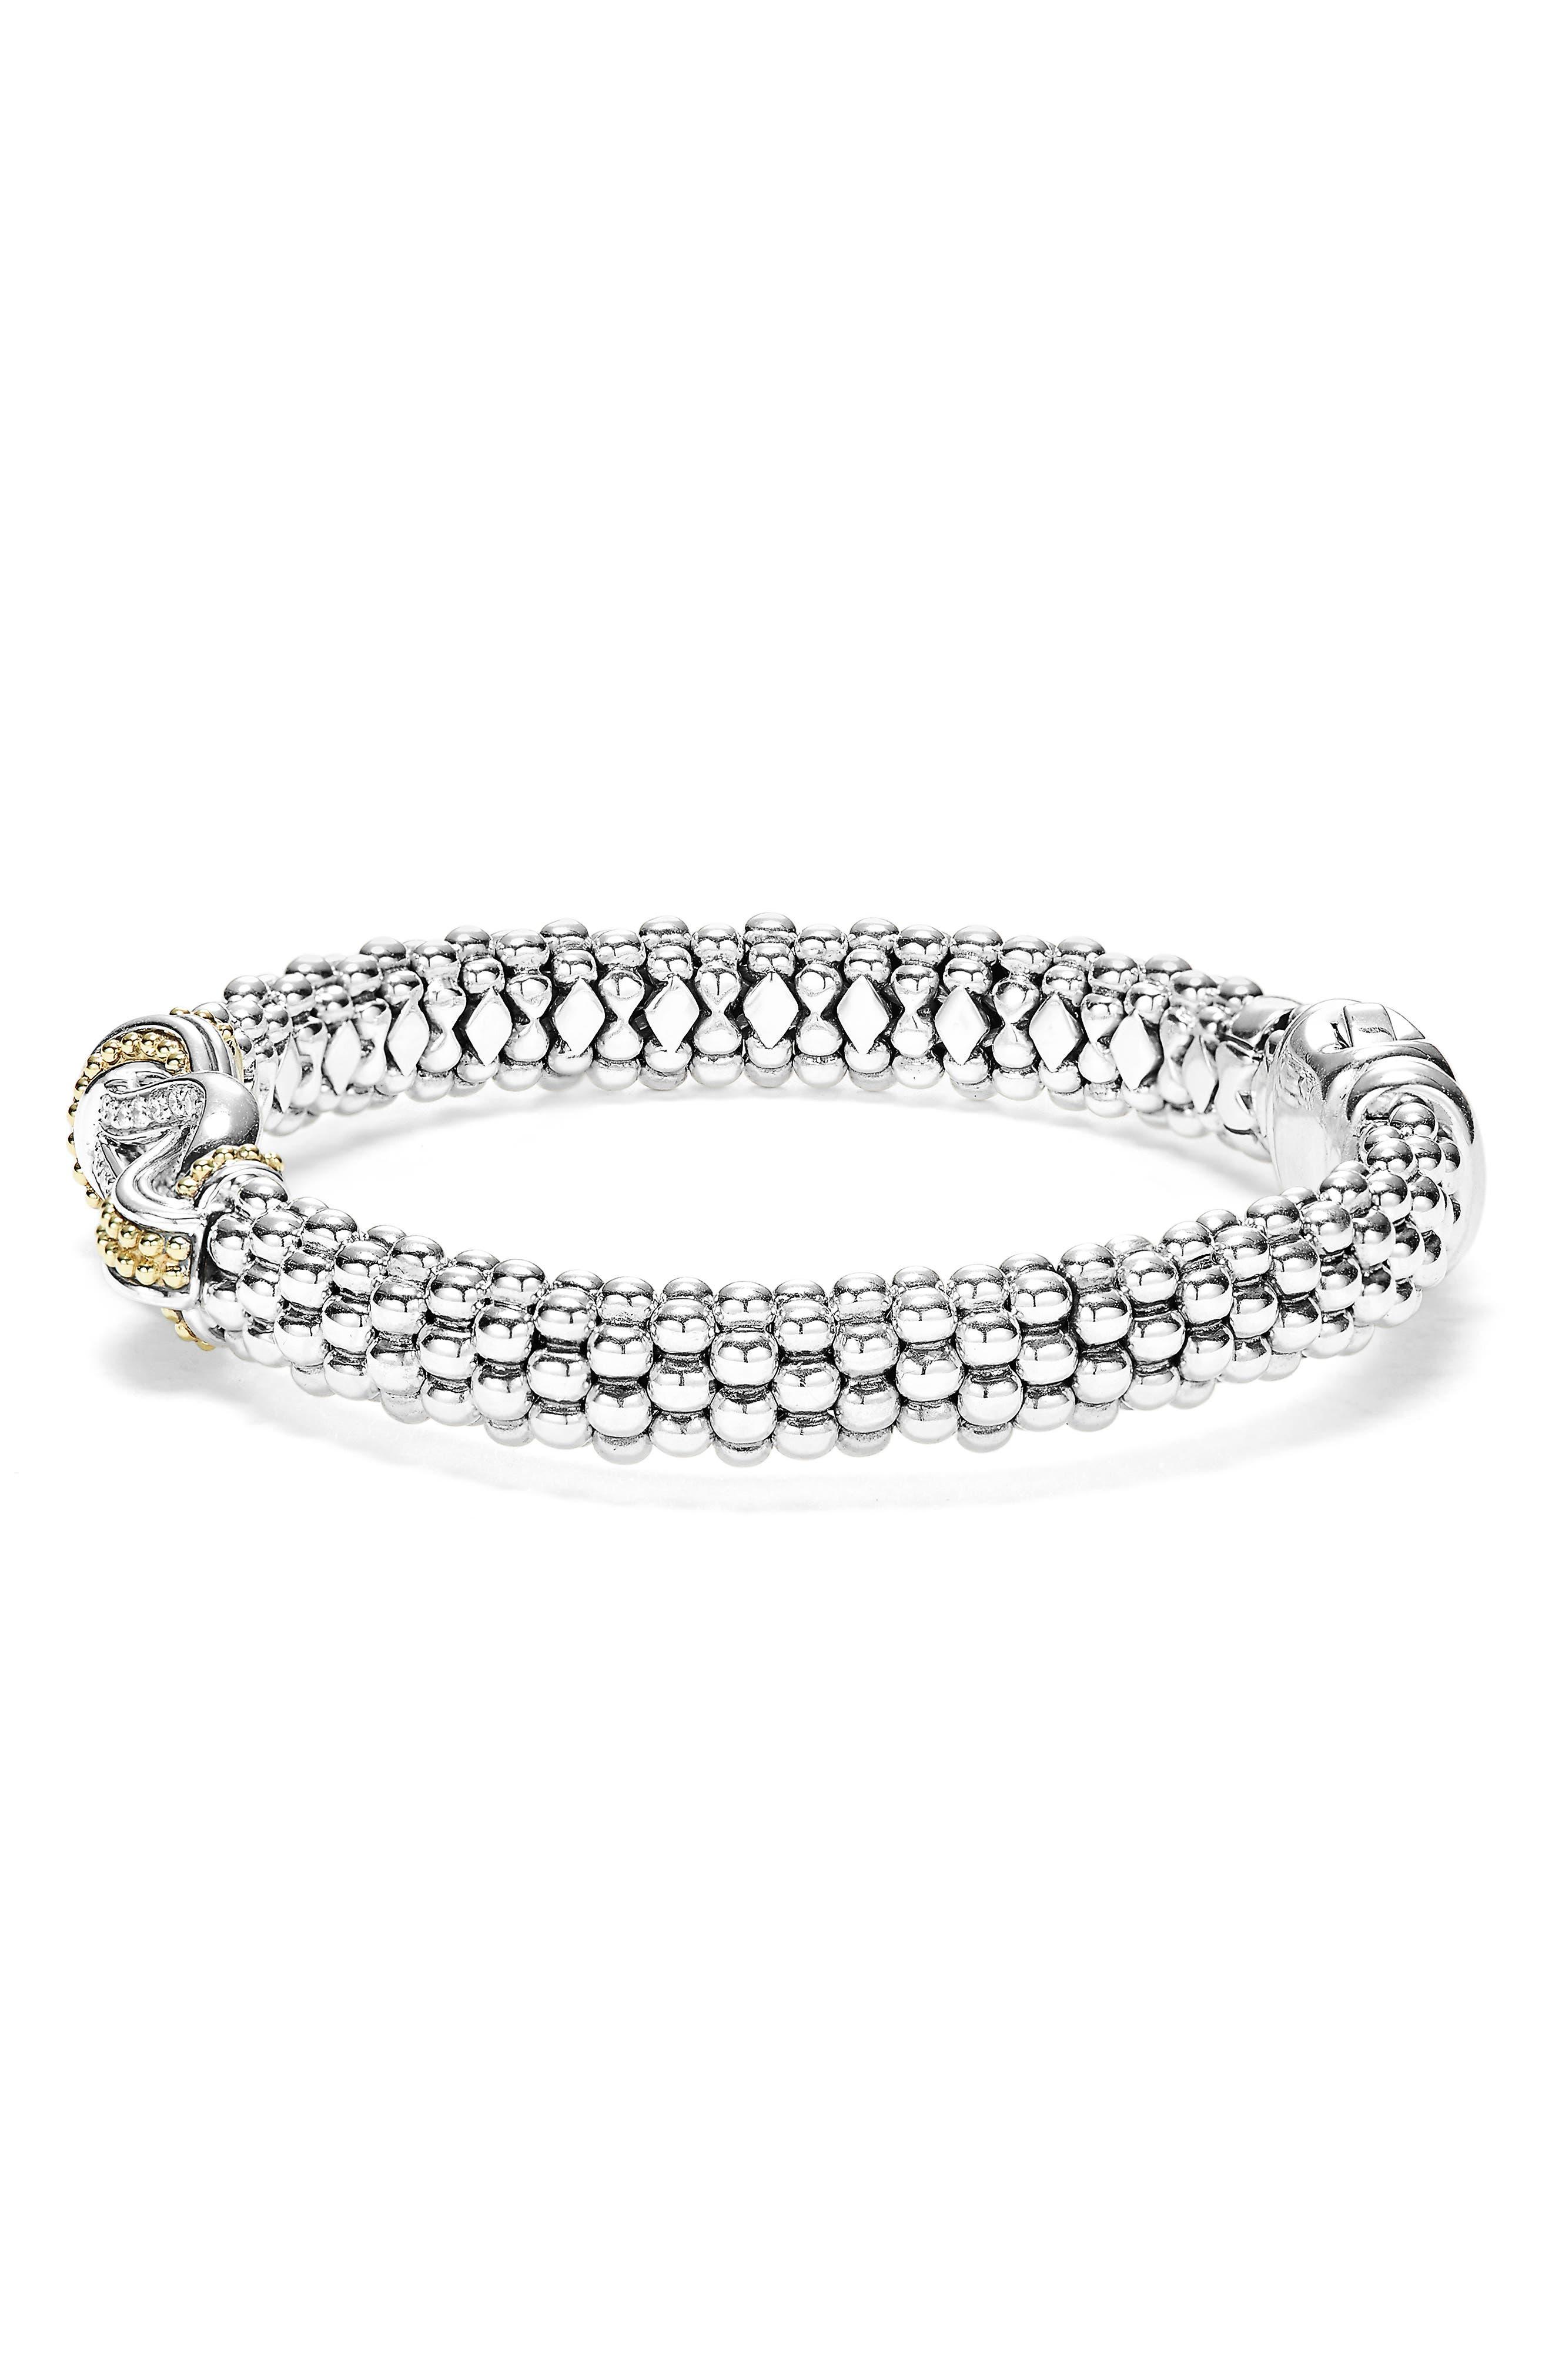 Caviar Newport Diamond Station Bracelet,                             Alternate thumbnail 3, color,                             SILVER/ GOLD